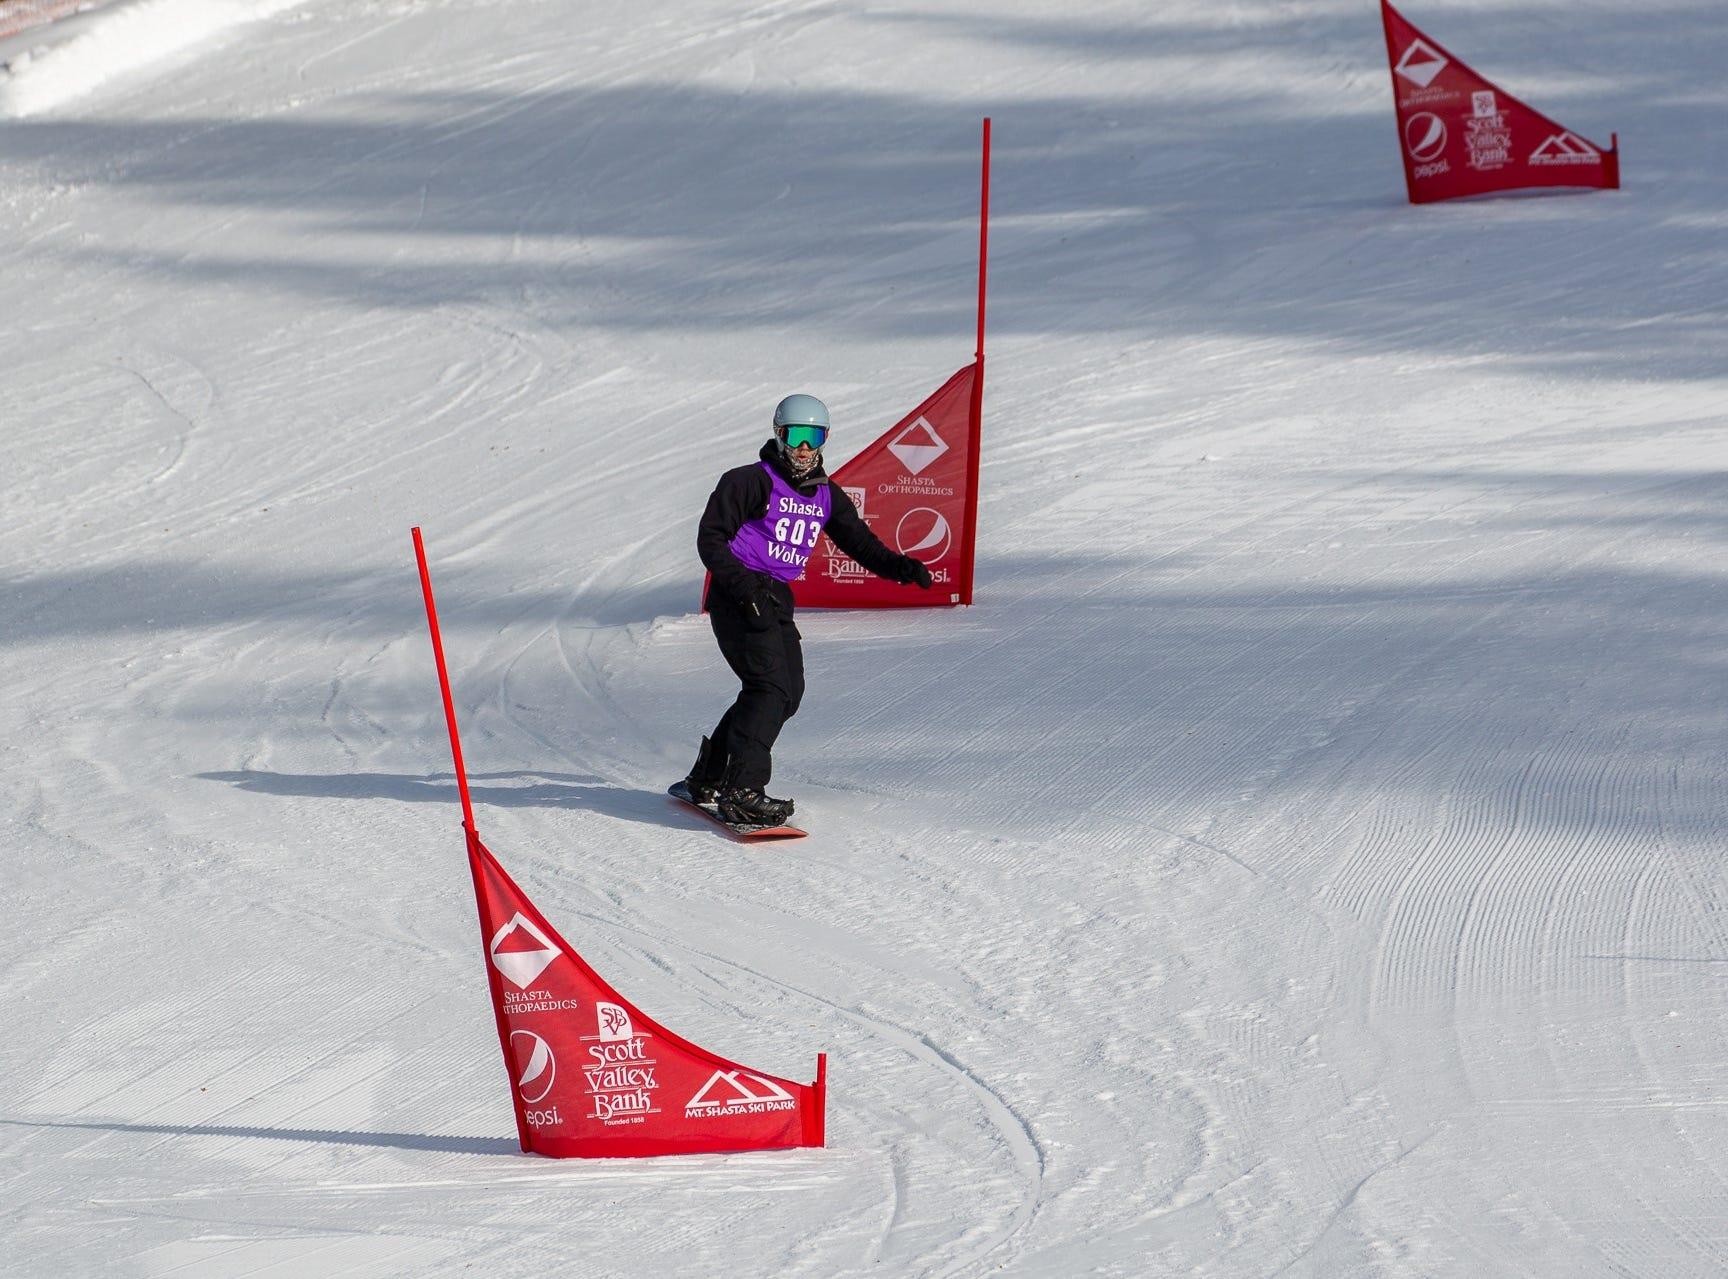 Gabe Rubanowitz of Shasta competes in the first high school snowboard meet of 2019 on Monday, Jan. 14 at Mt. Shasta Ski Park.